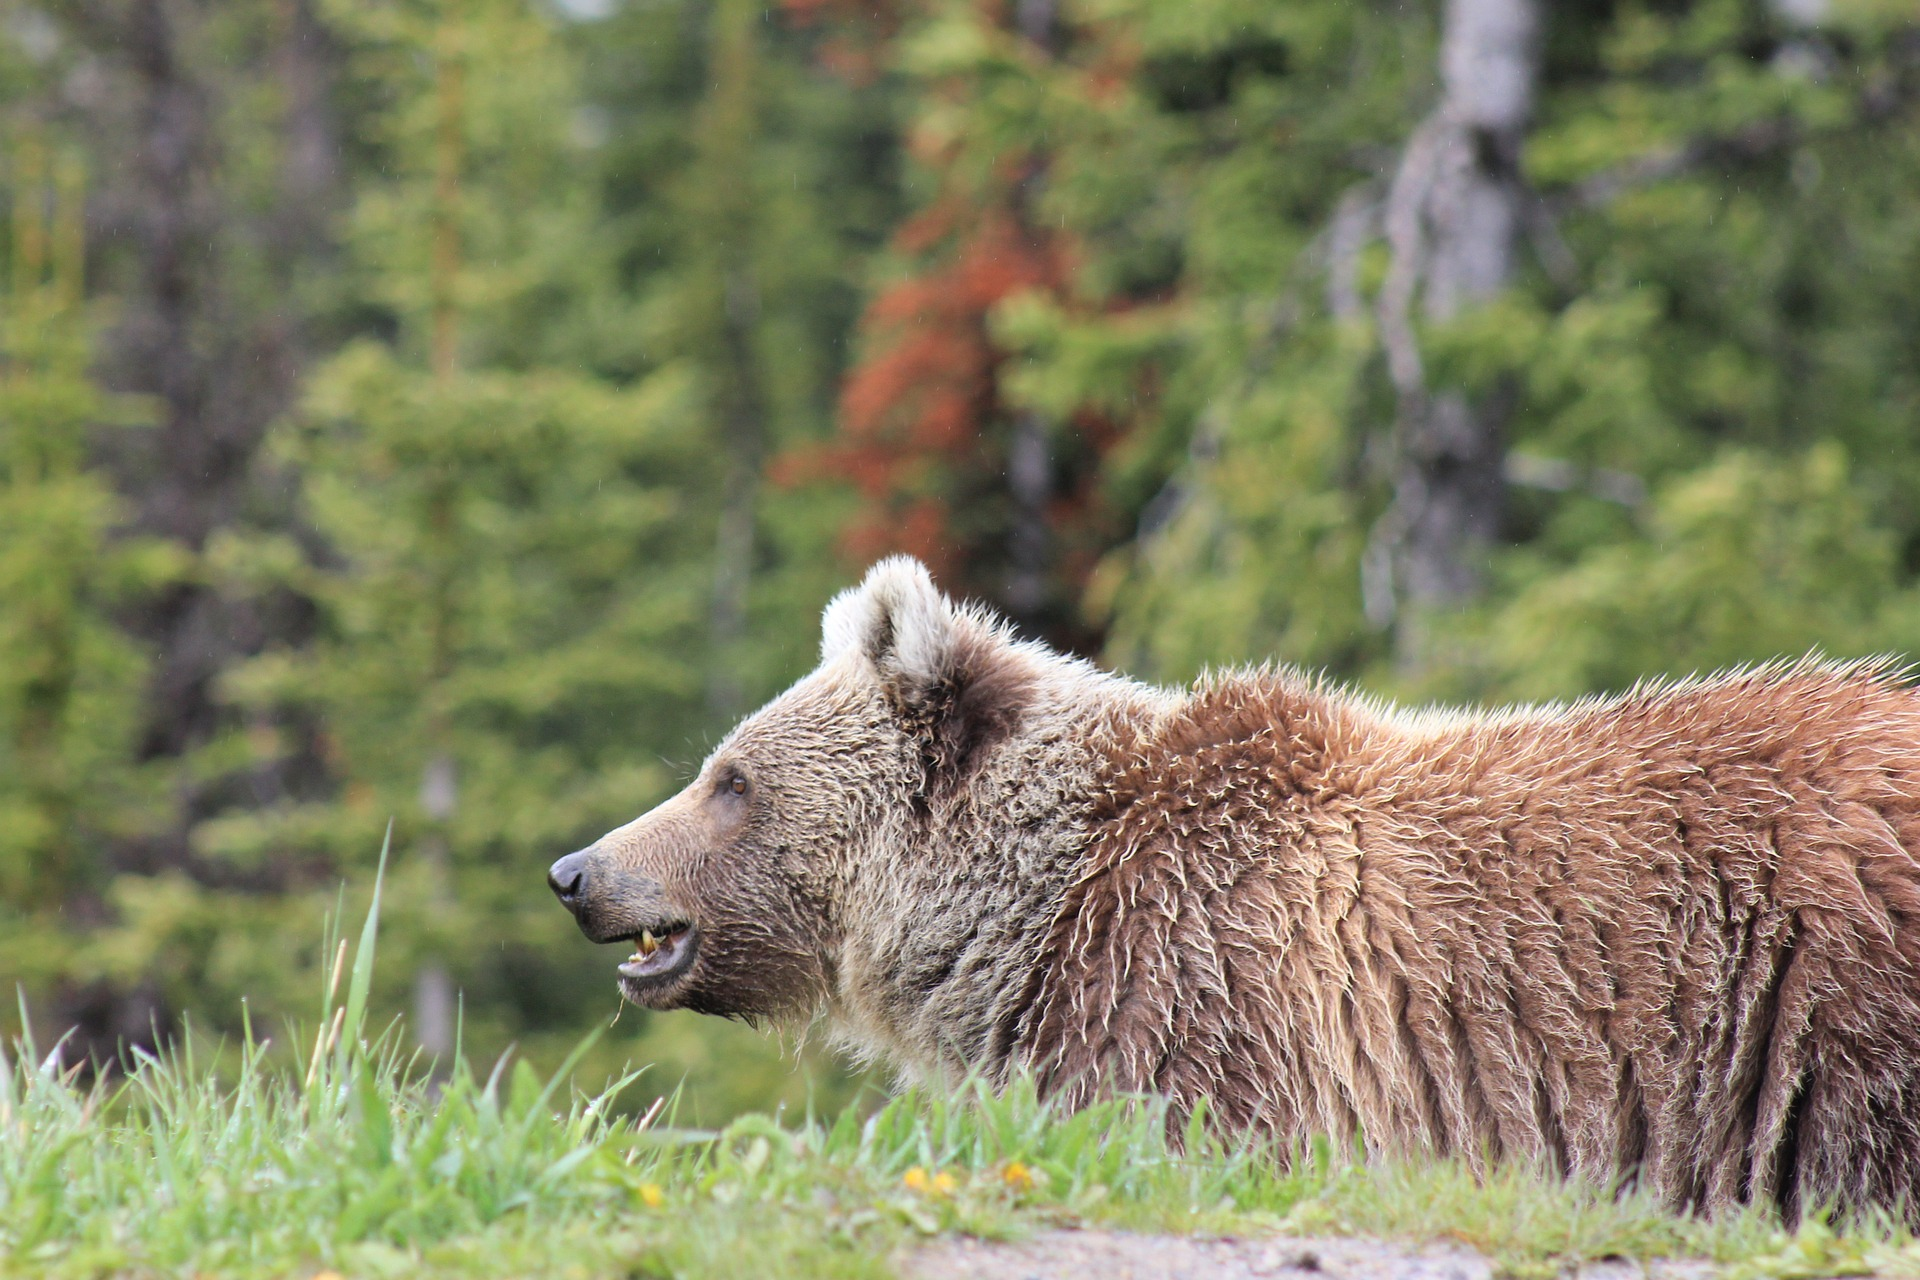 bear-2960919_1920.jpg